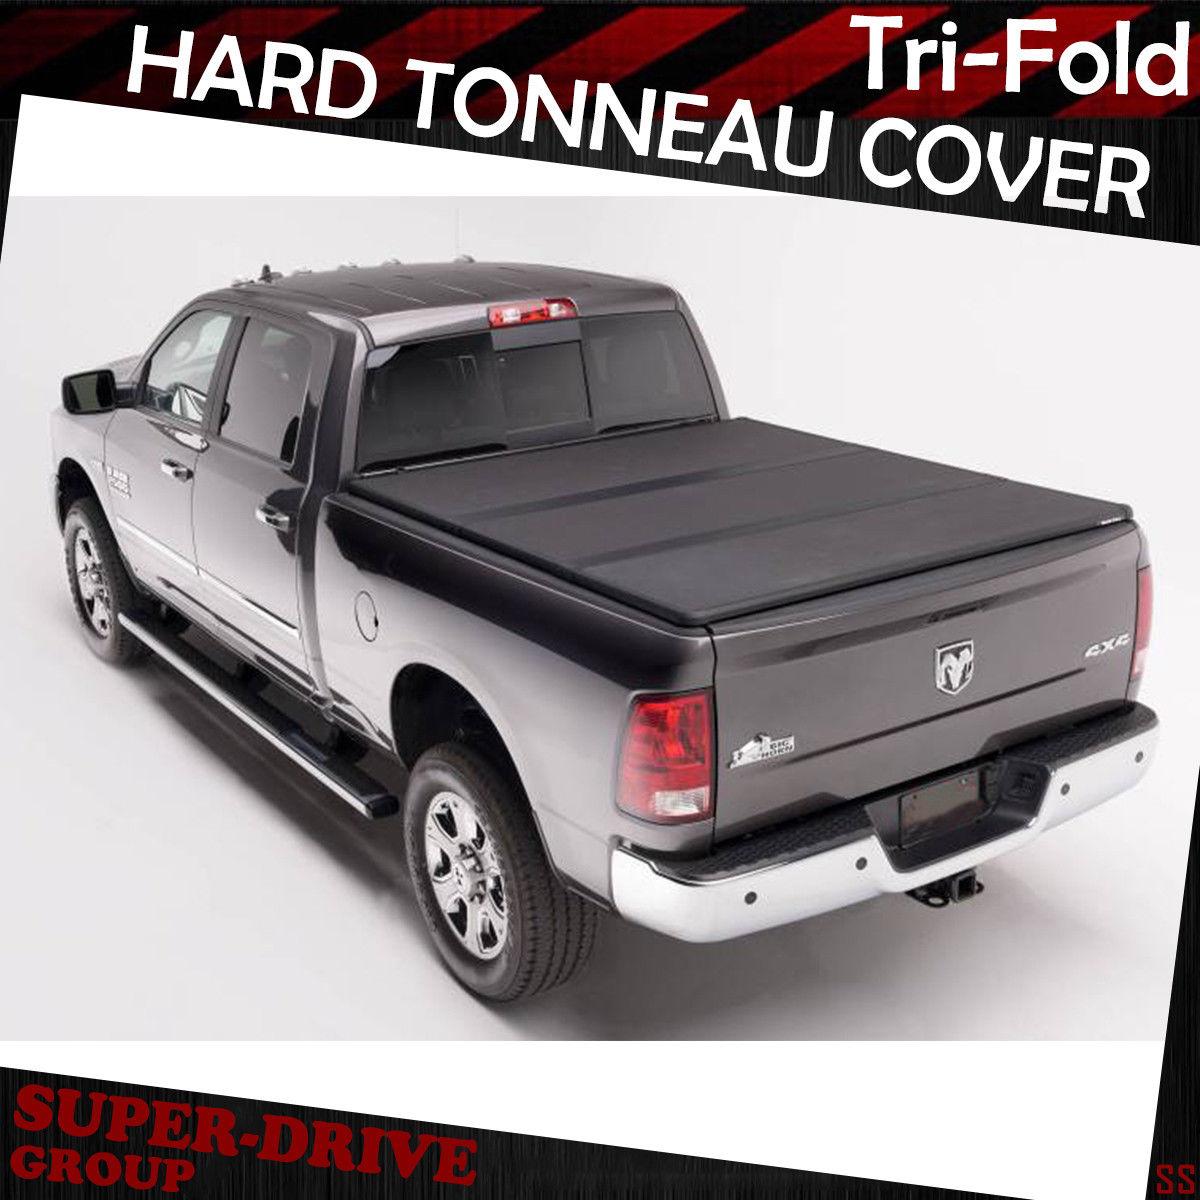 Tri Fold Hard Tonneau Covers For 2002 2018 Dodge Ram 1500 8 Ft 96 Bed Cargo Box Ebay